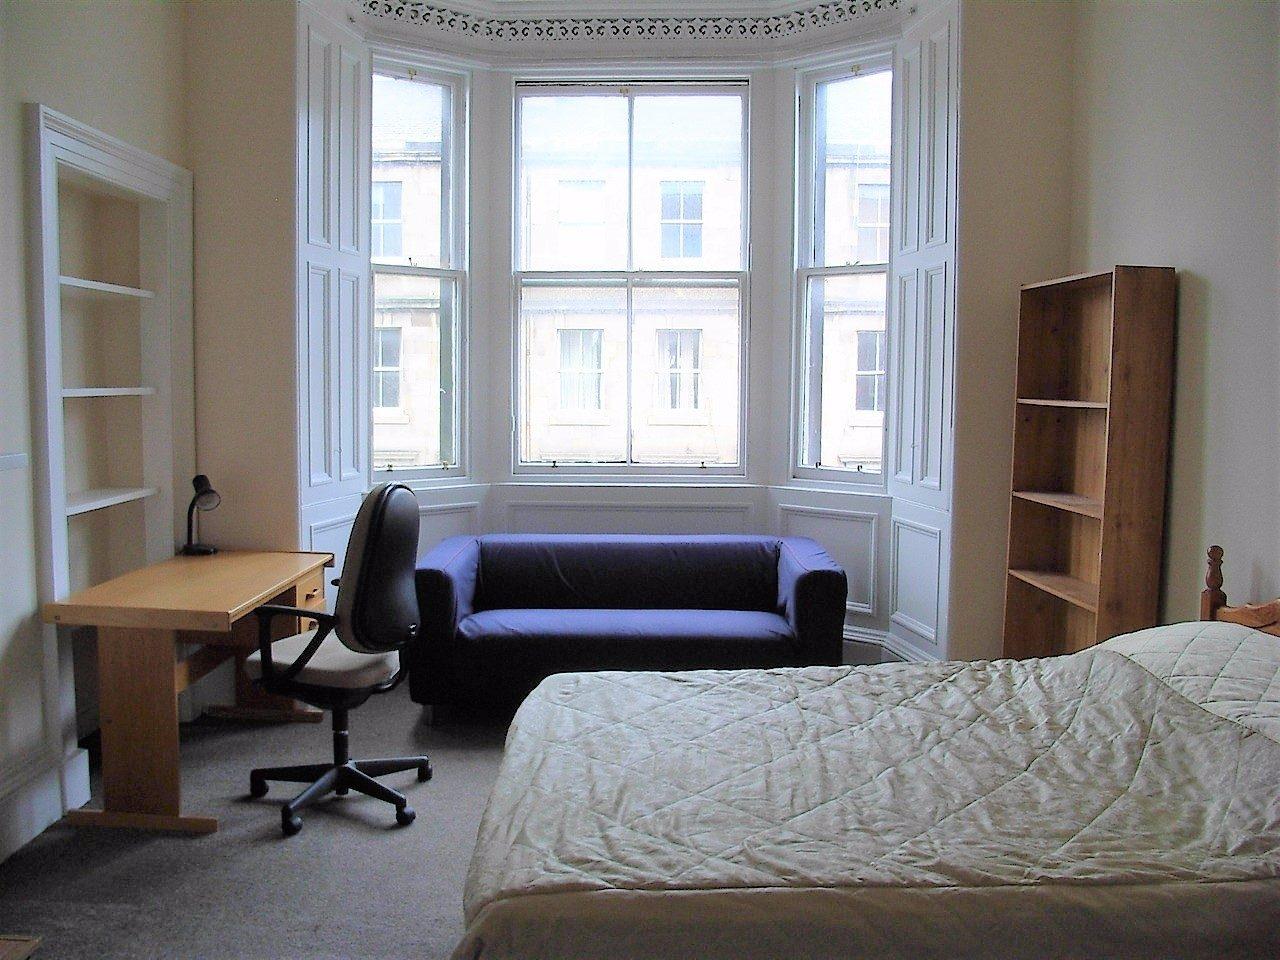 Bright & Spacious Four Bedroom Flat in Edinburgh - The ...